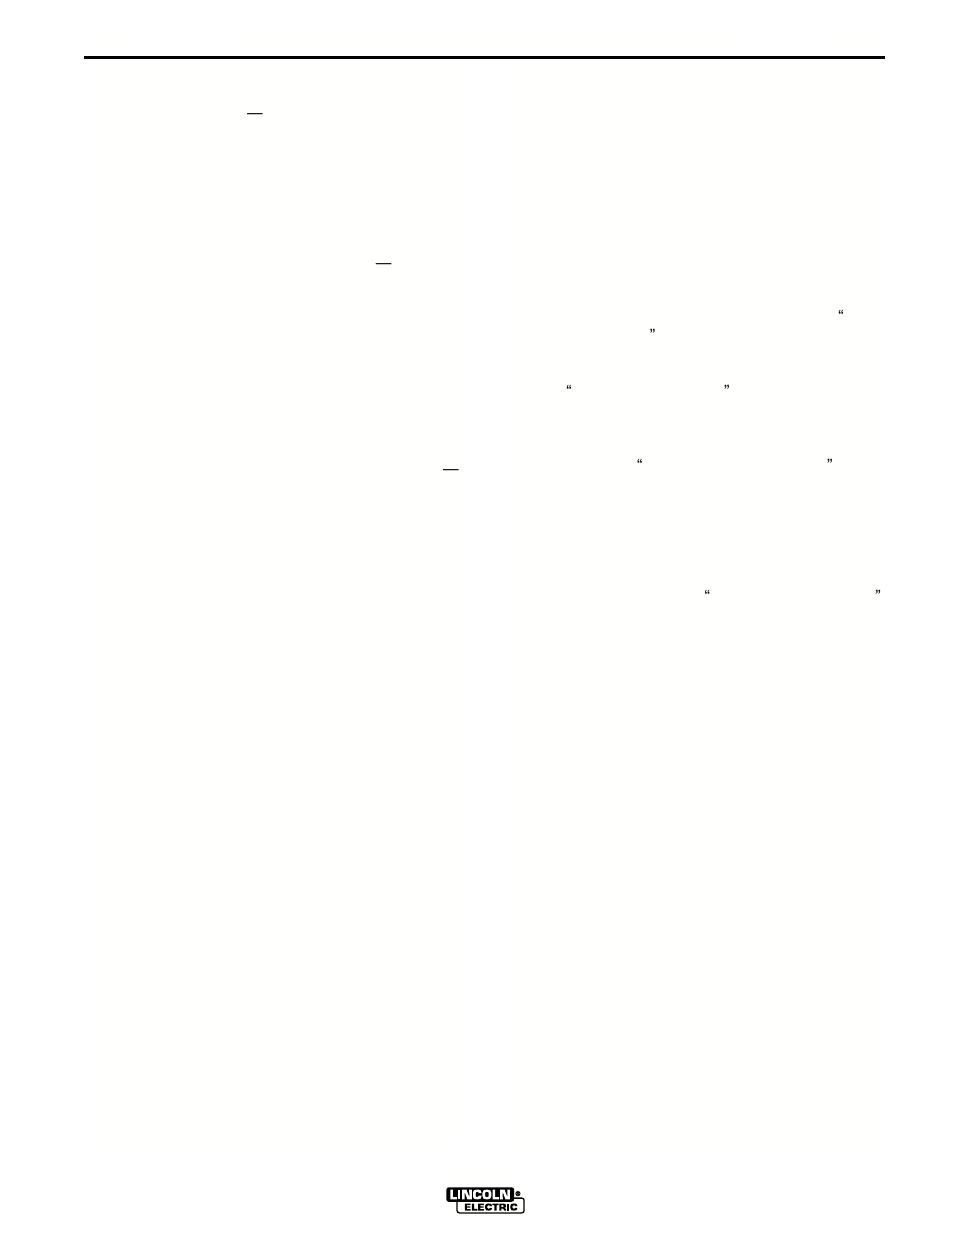 Accessories | Lincoln Electric IM563 PRO 155 User Manual